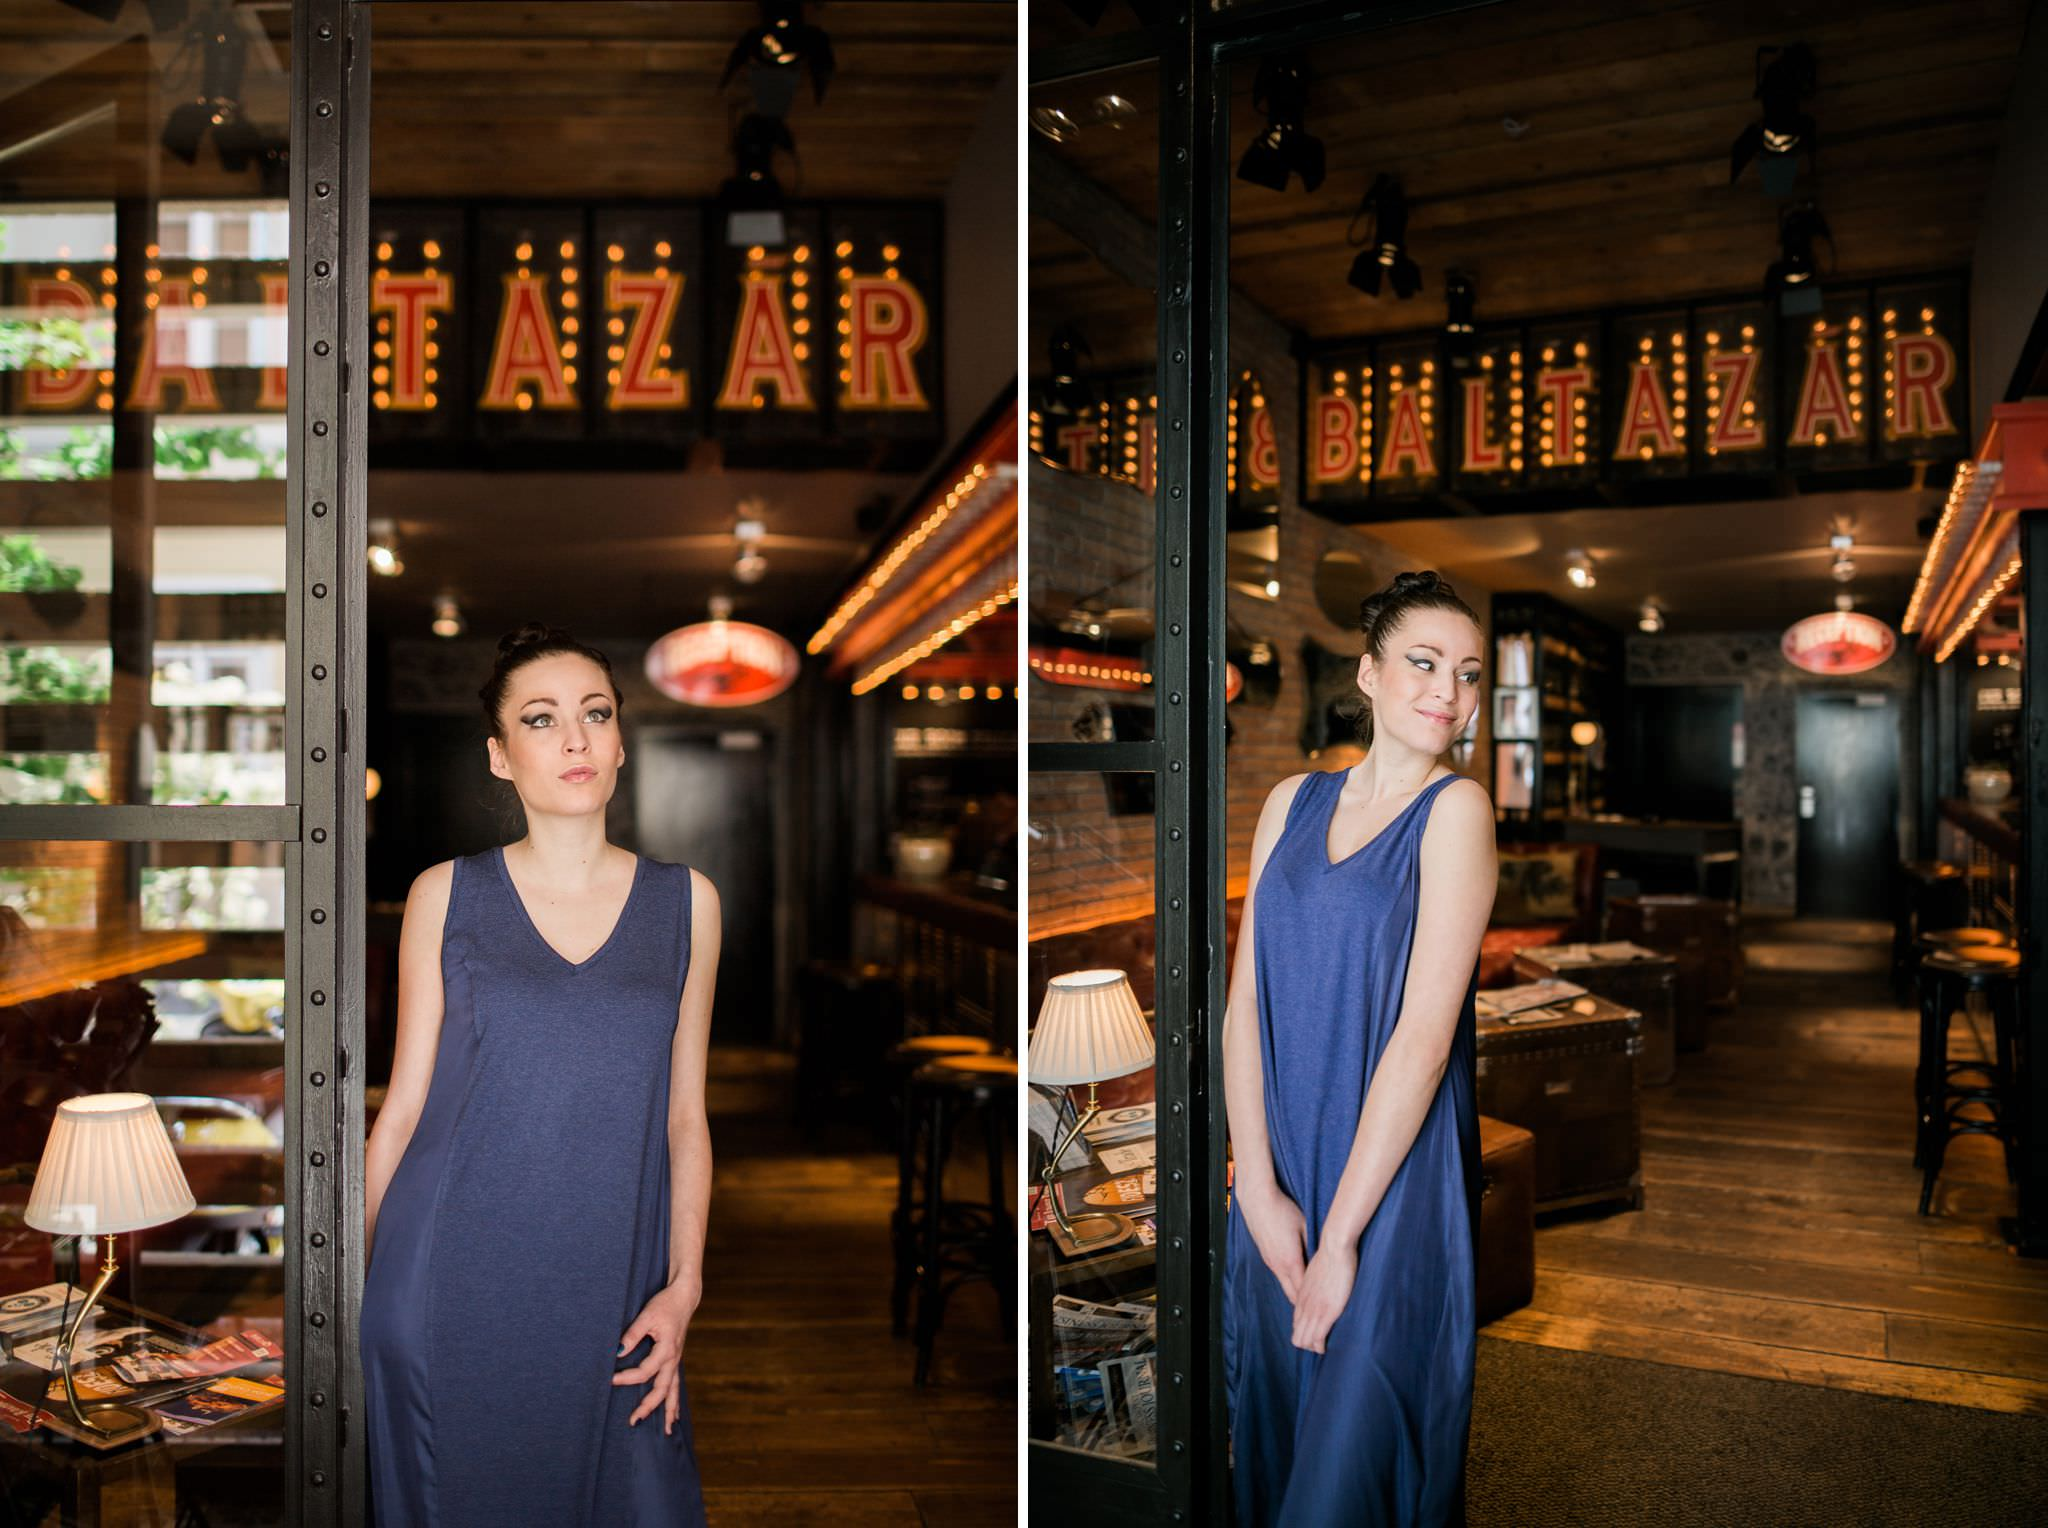 47-Rokolya_Fashion_Editorial_Lookbook_Baltazar_Budapest